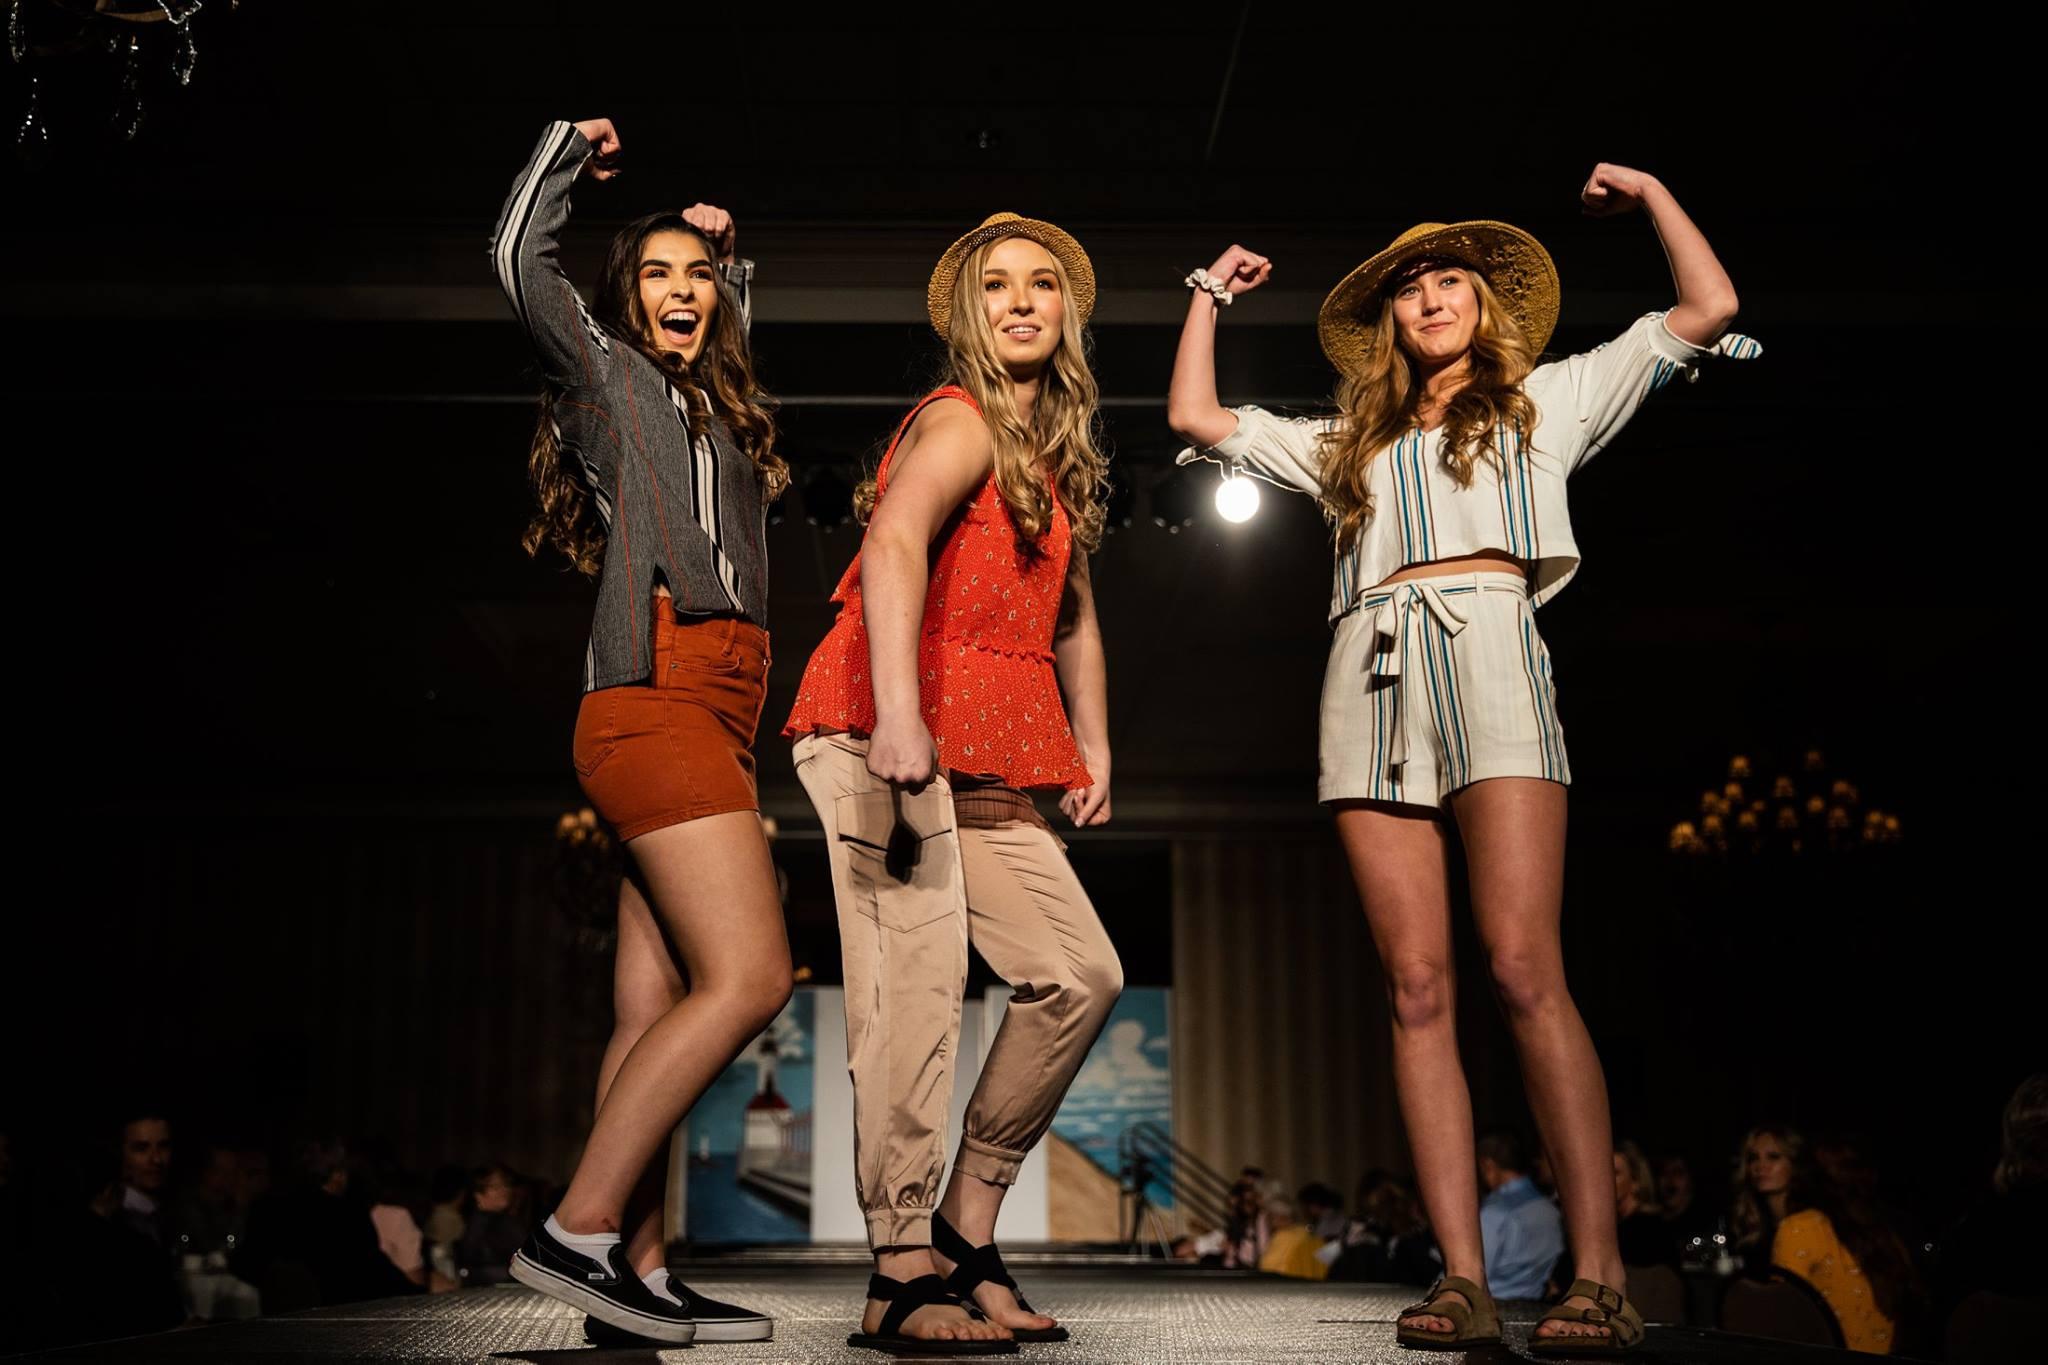 Lutheran_North_High_School_Macomb_Michigan_LHN_Fashion_Show_2019 (8).jpg